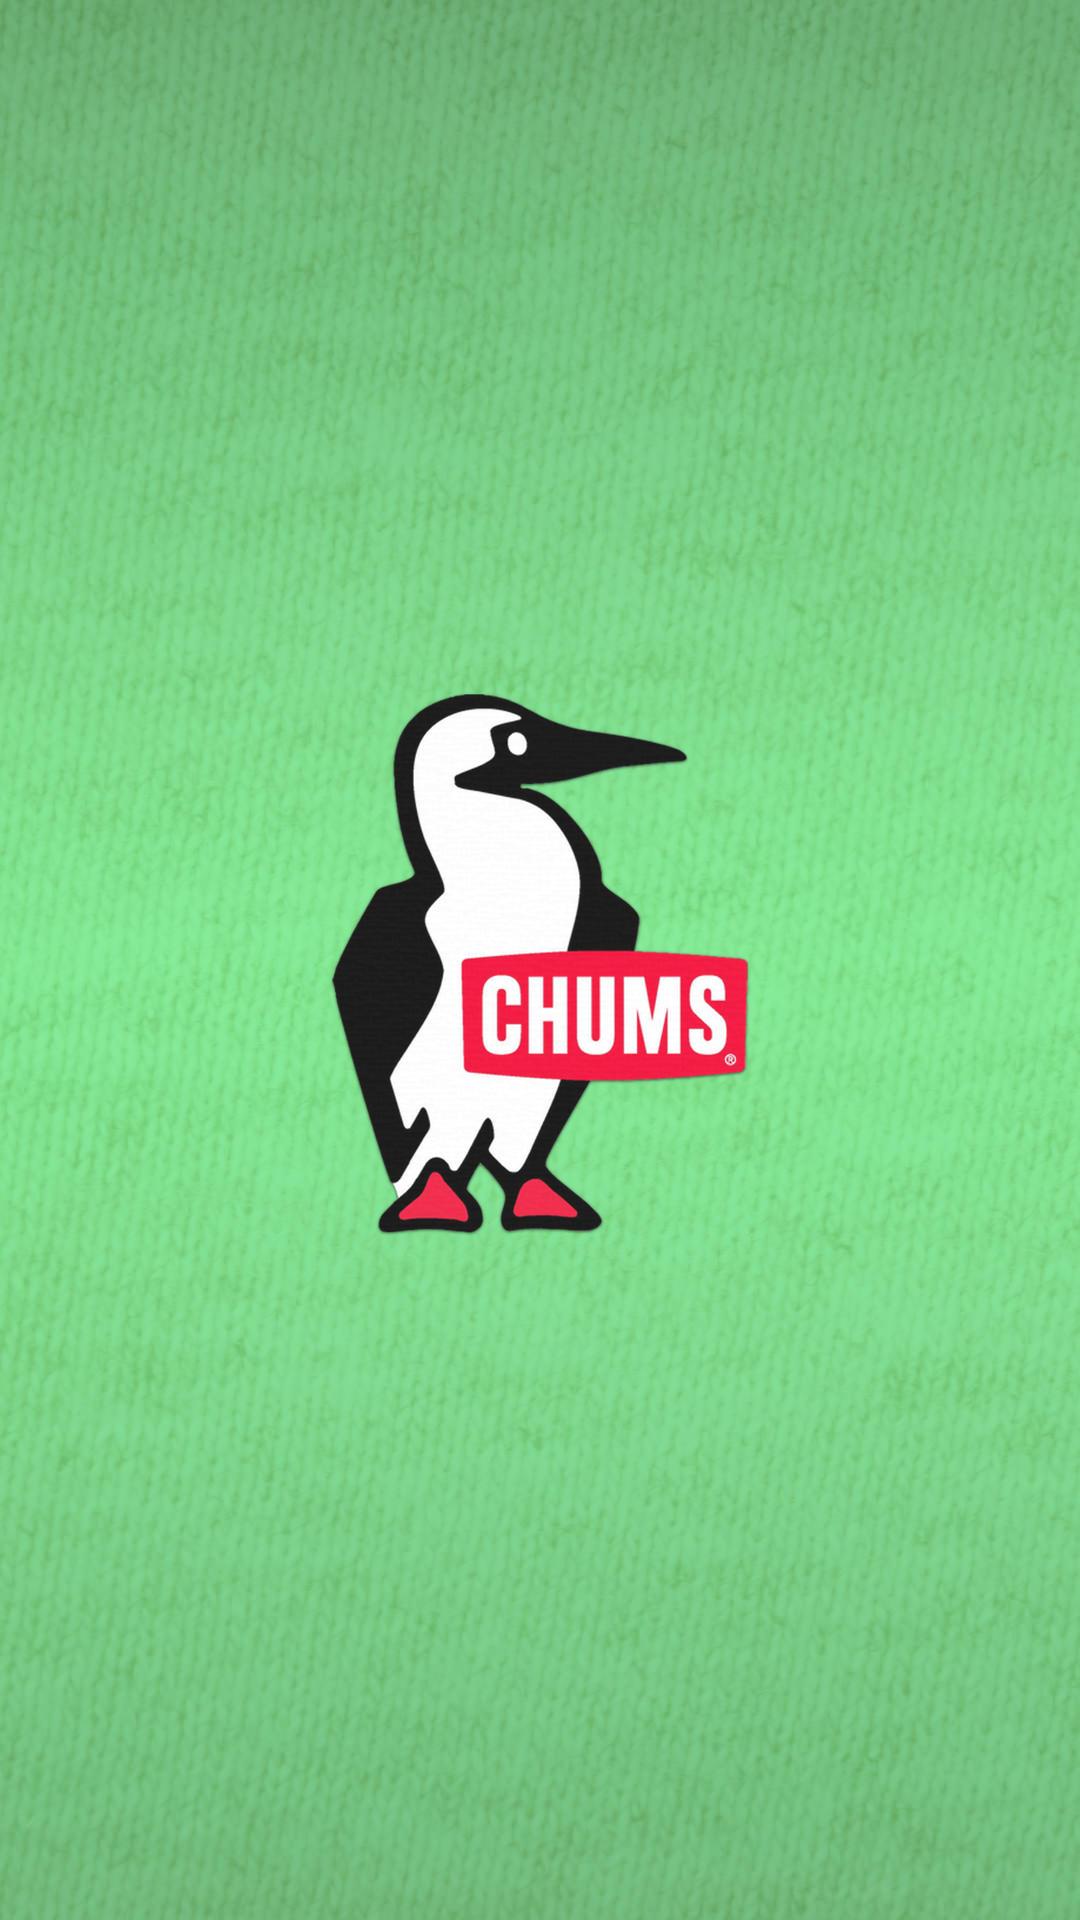 chums12 - CHUMS[チャムス]の高画質スマホ壁紙50枚 [iPhone&Androidに対応]